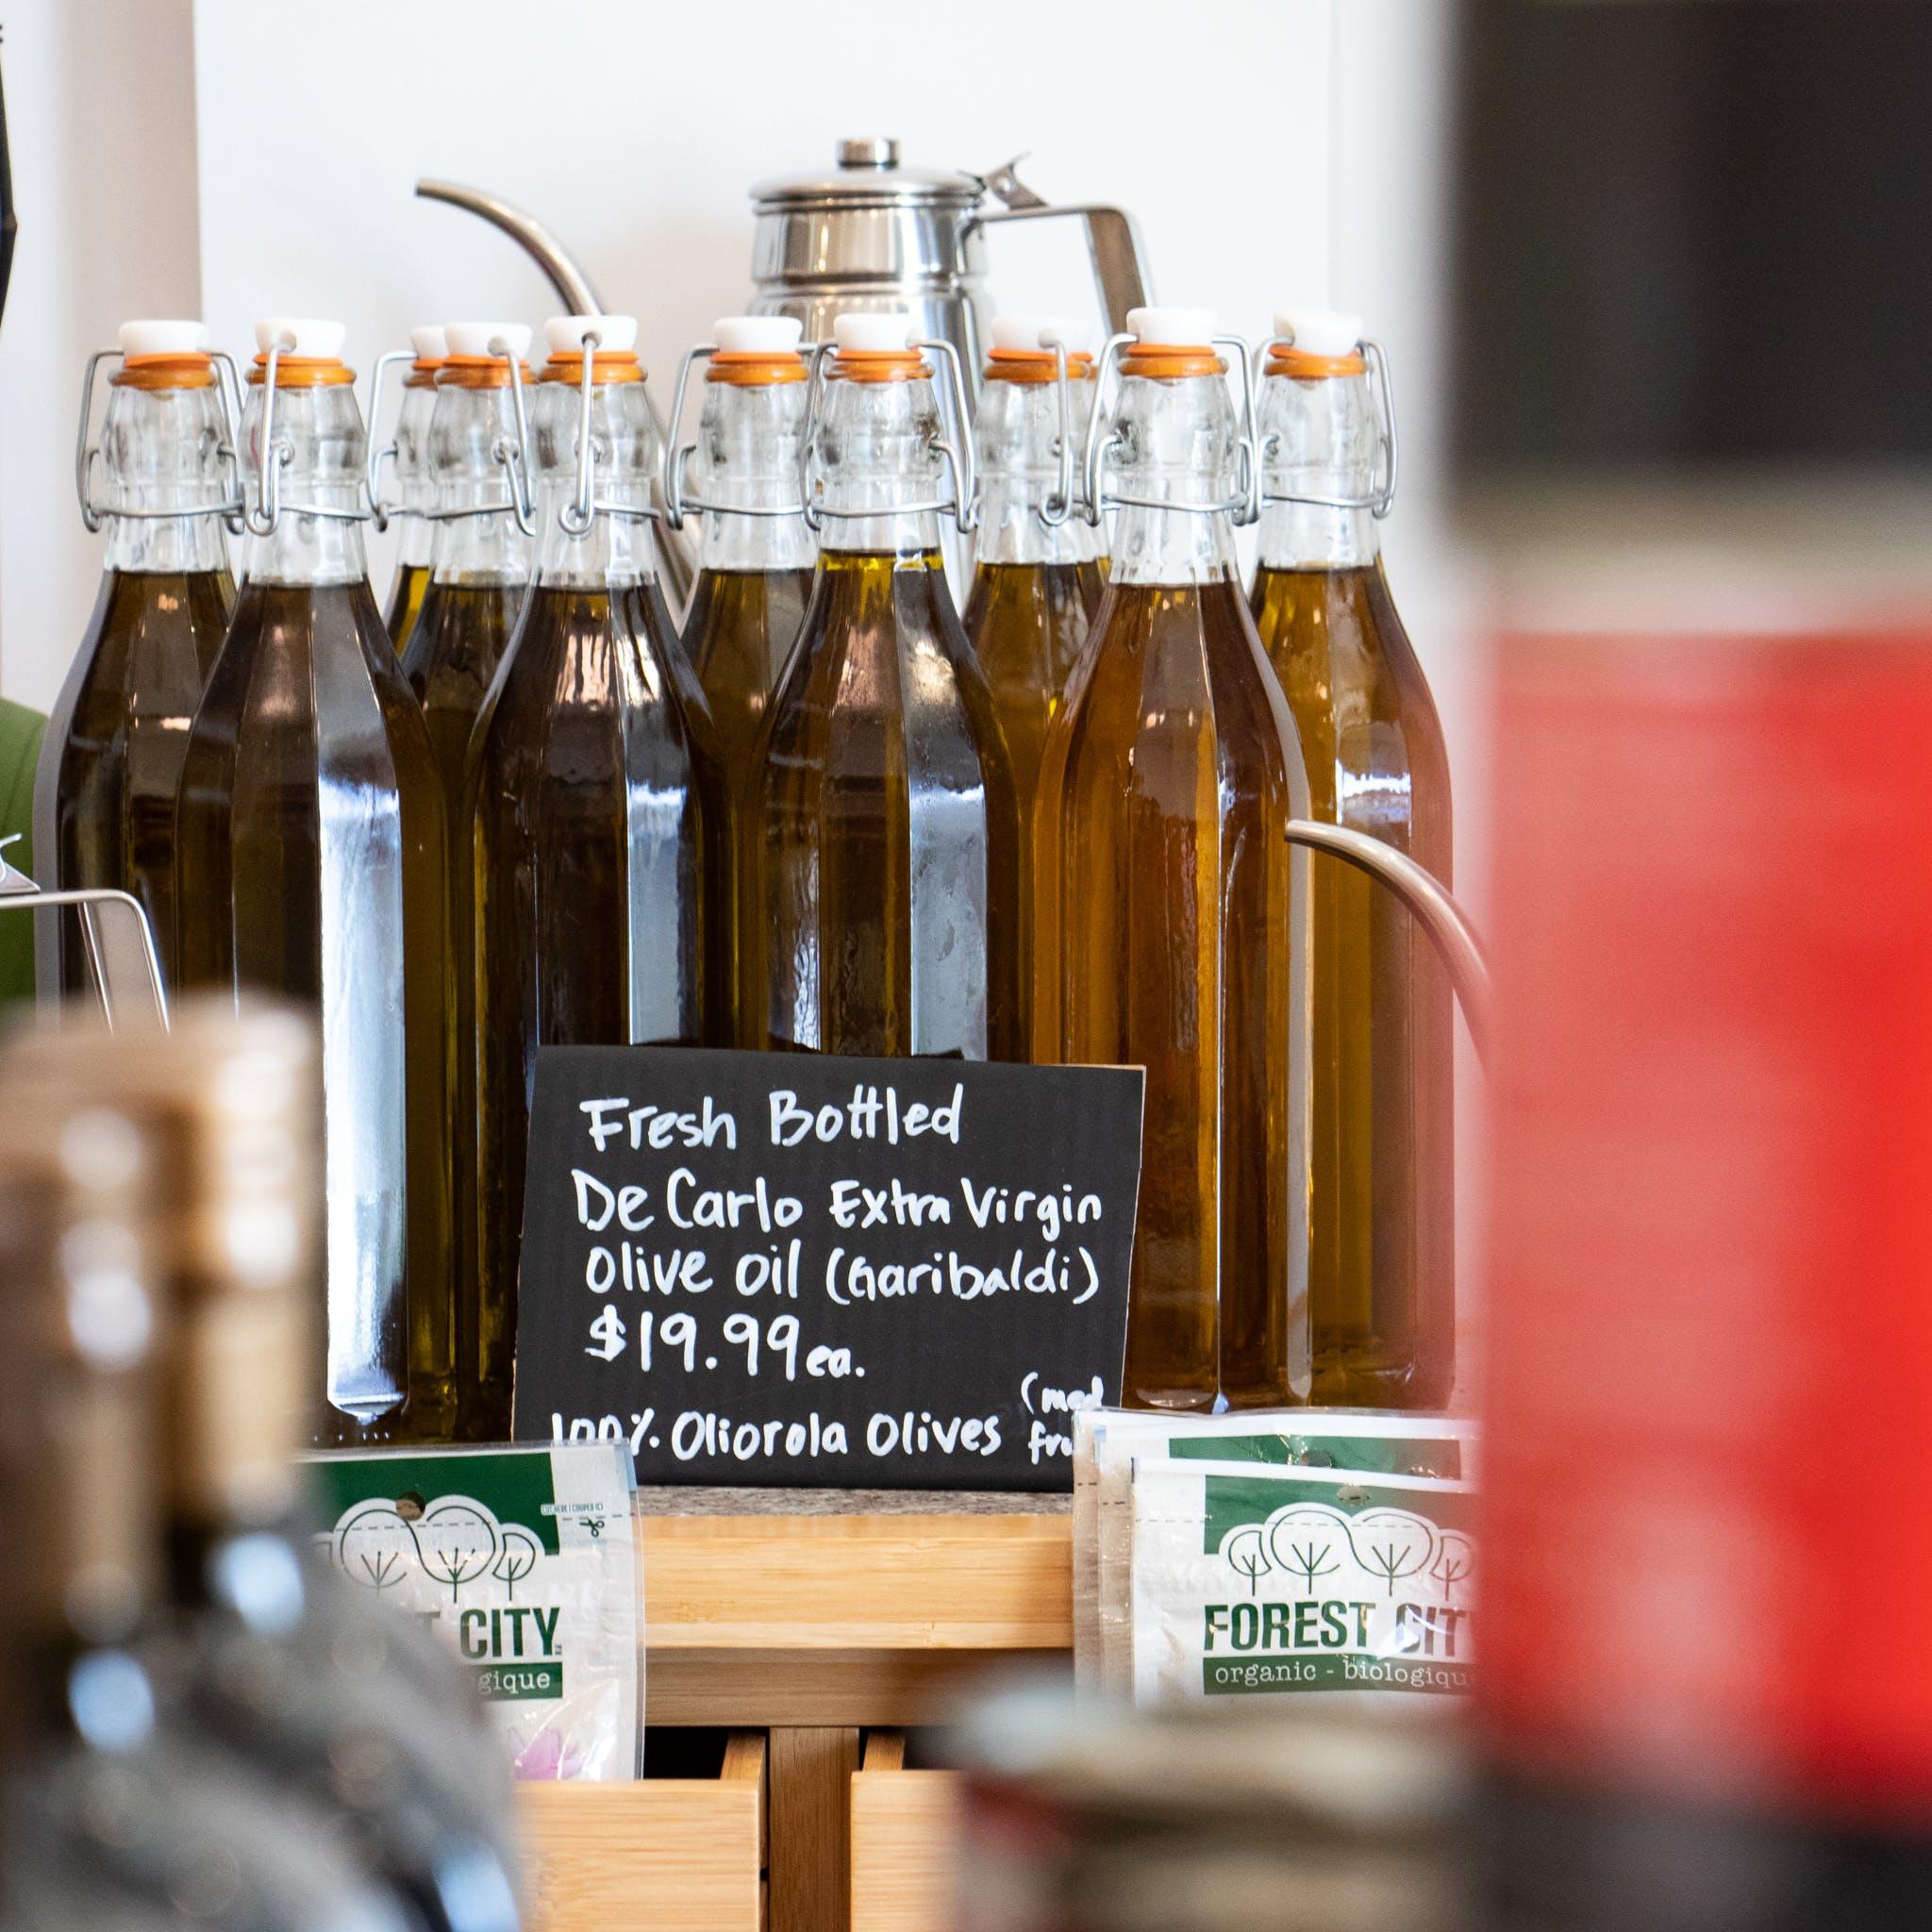 Fresh bottled olive oil from La Spesa Food Market. Image by: @paothebao